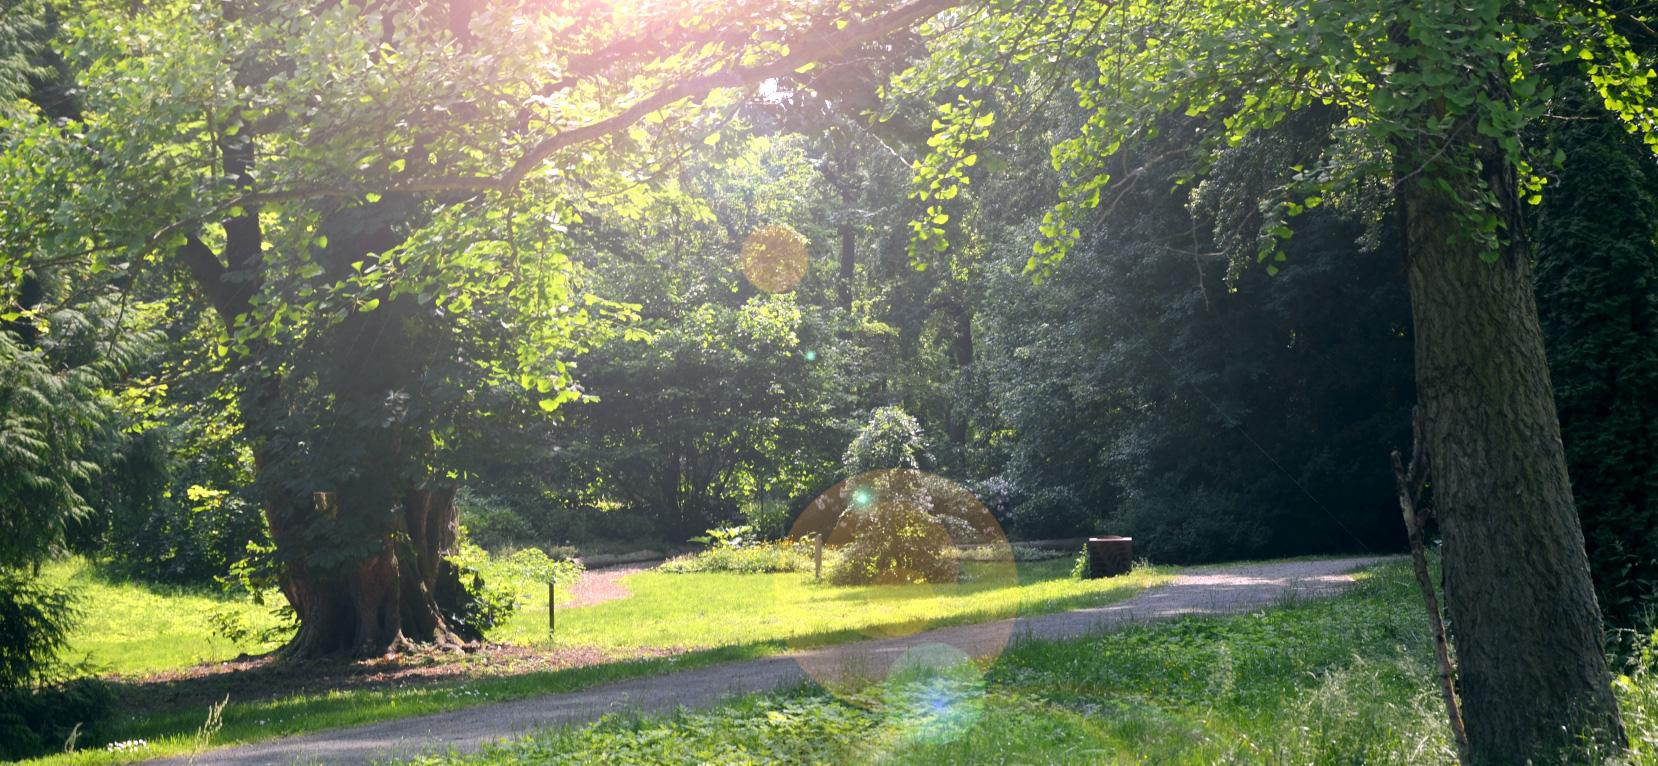 Park Und Spar Hannover